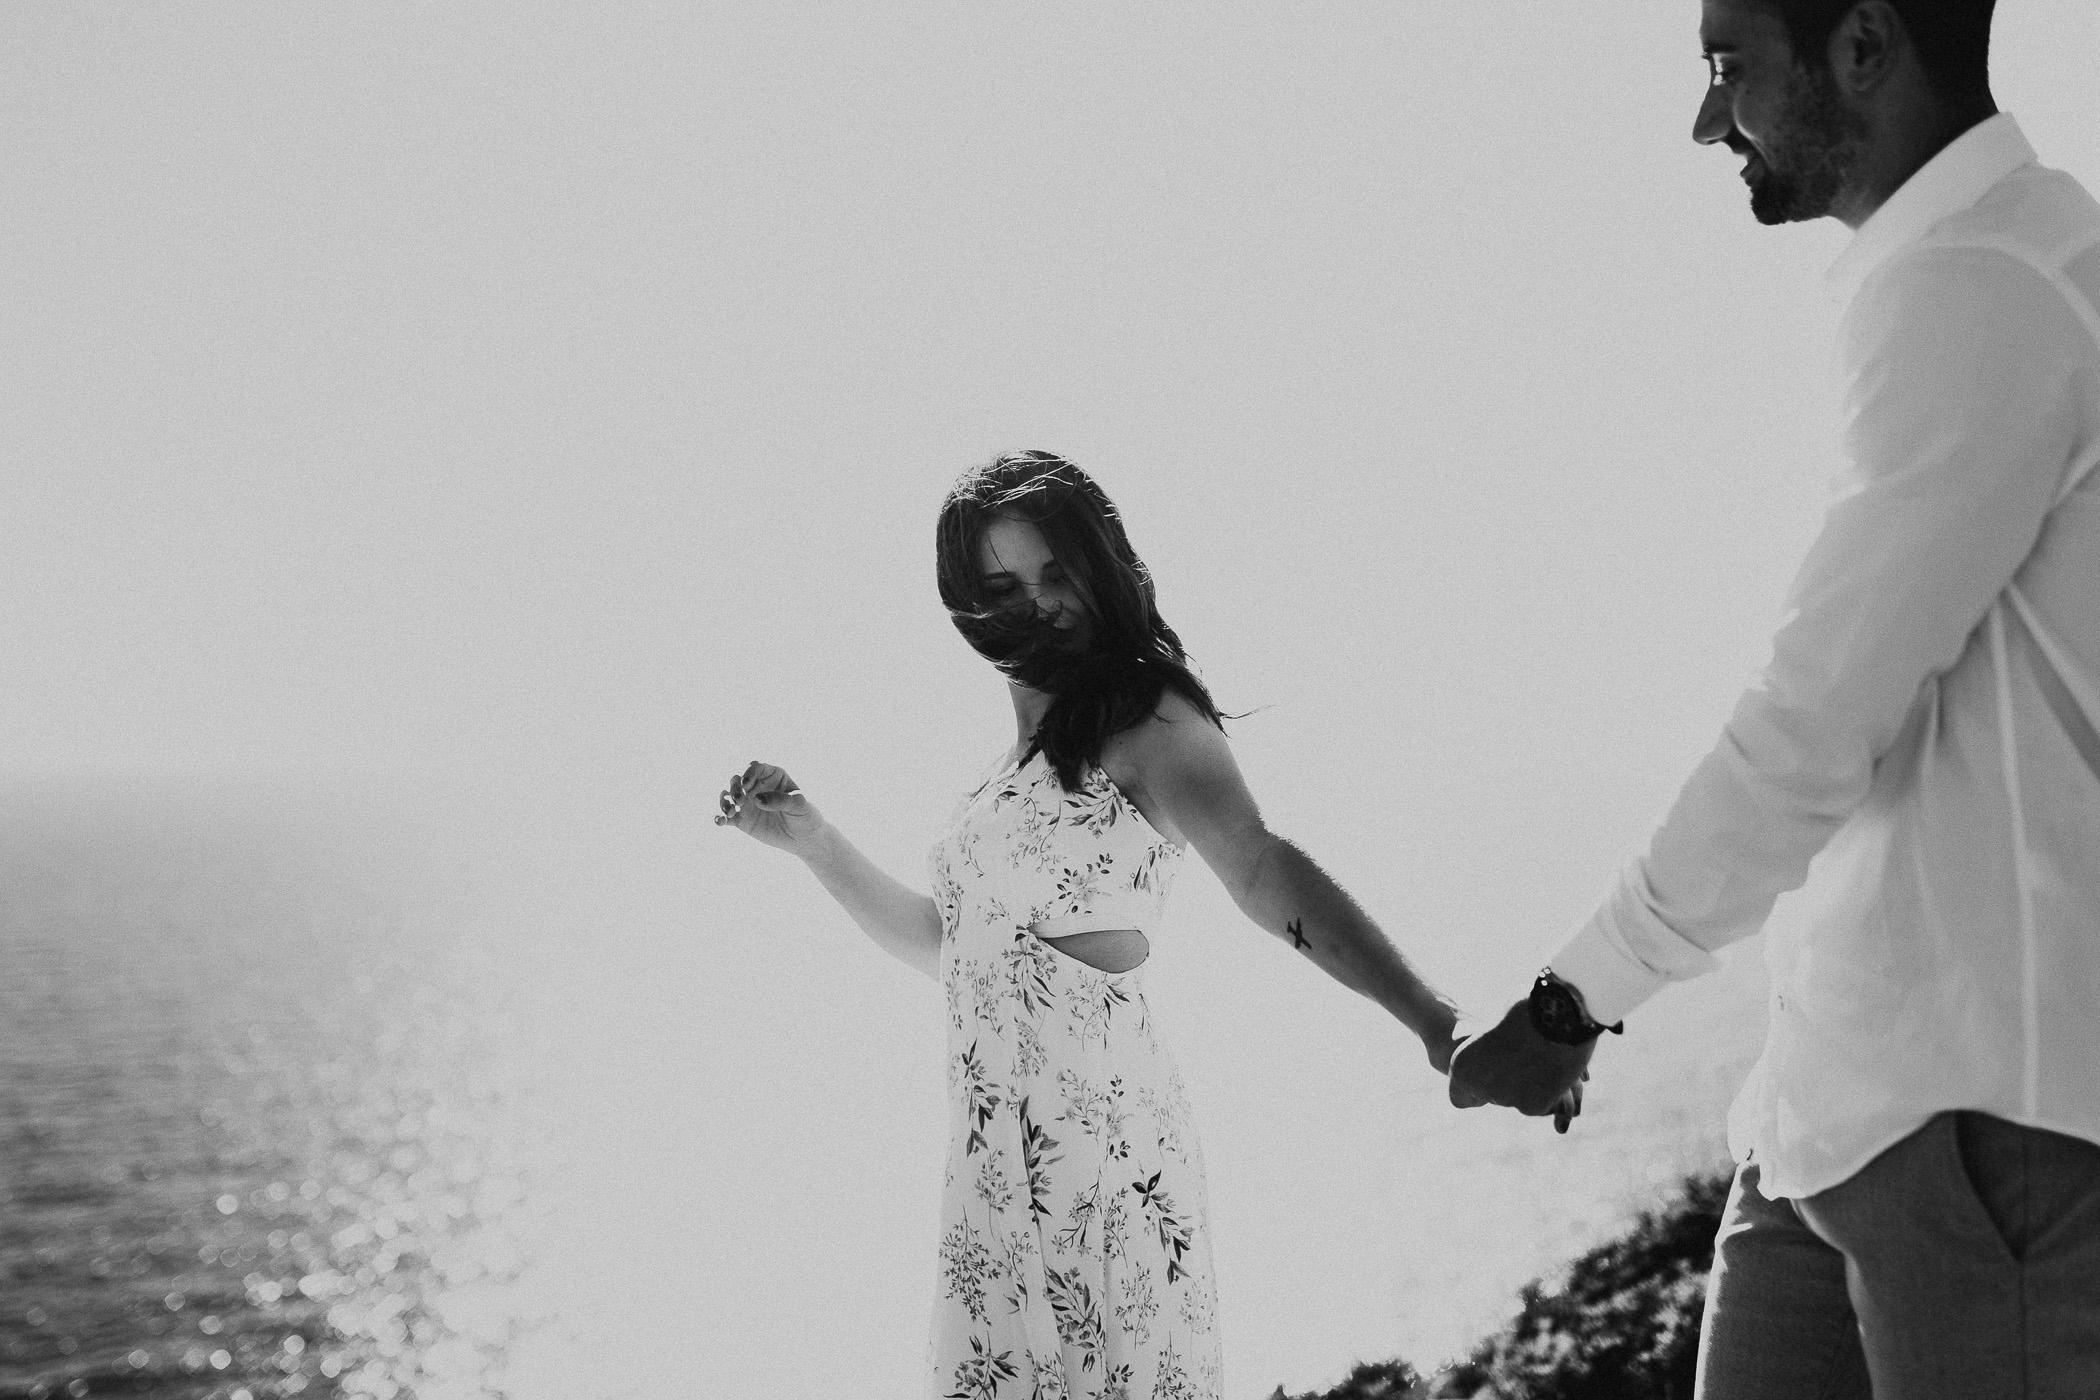 DanielaMarquardtPhotography_wedding_elopement_mallorca_spain_calapi_palma_lauraandtoni_71